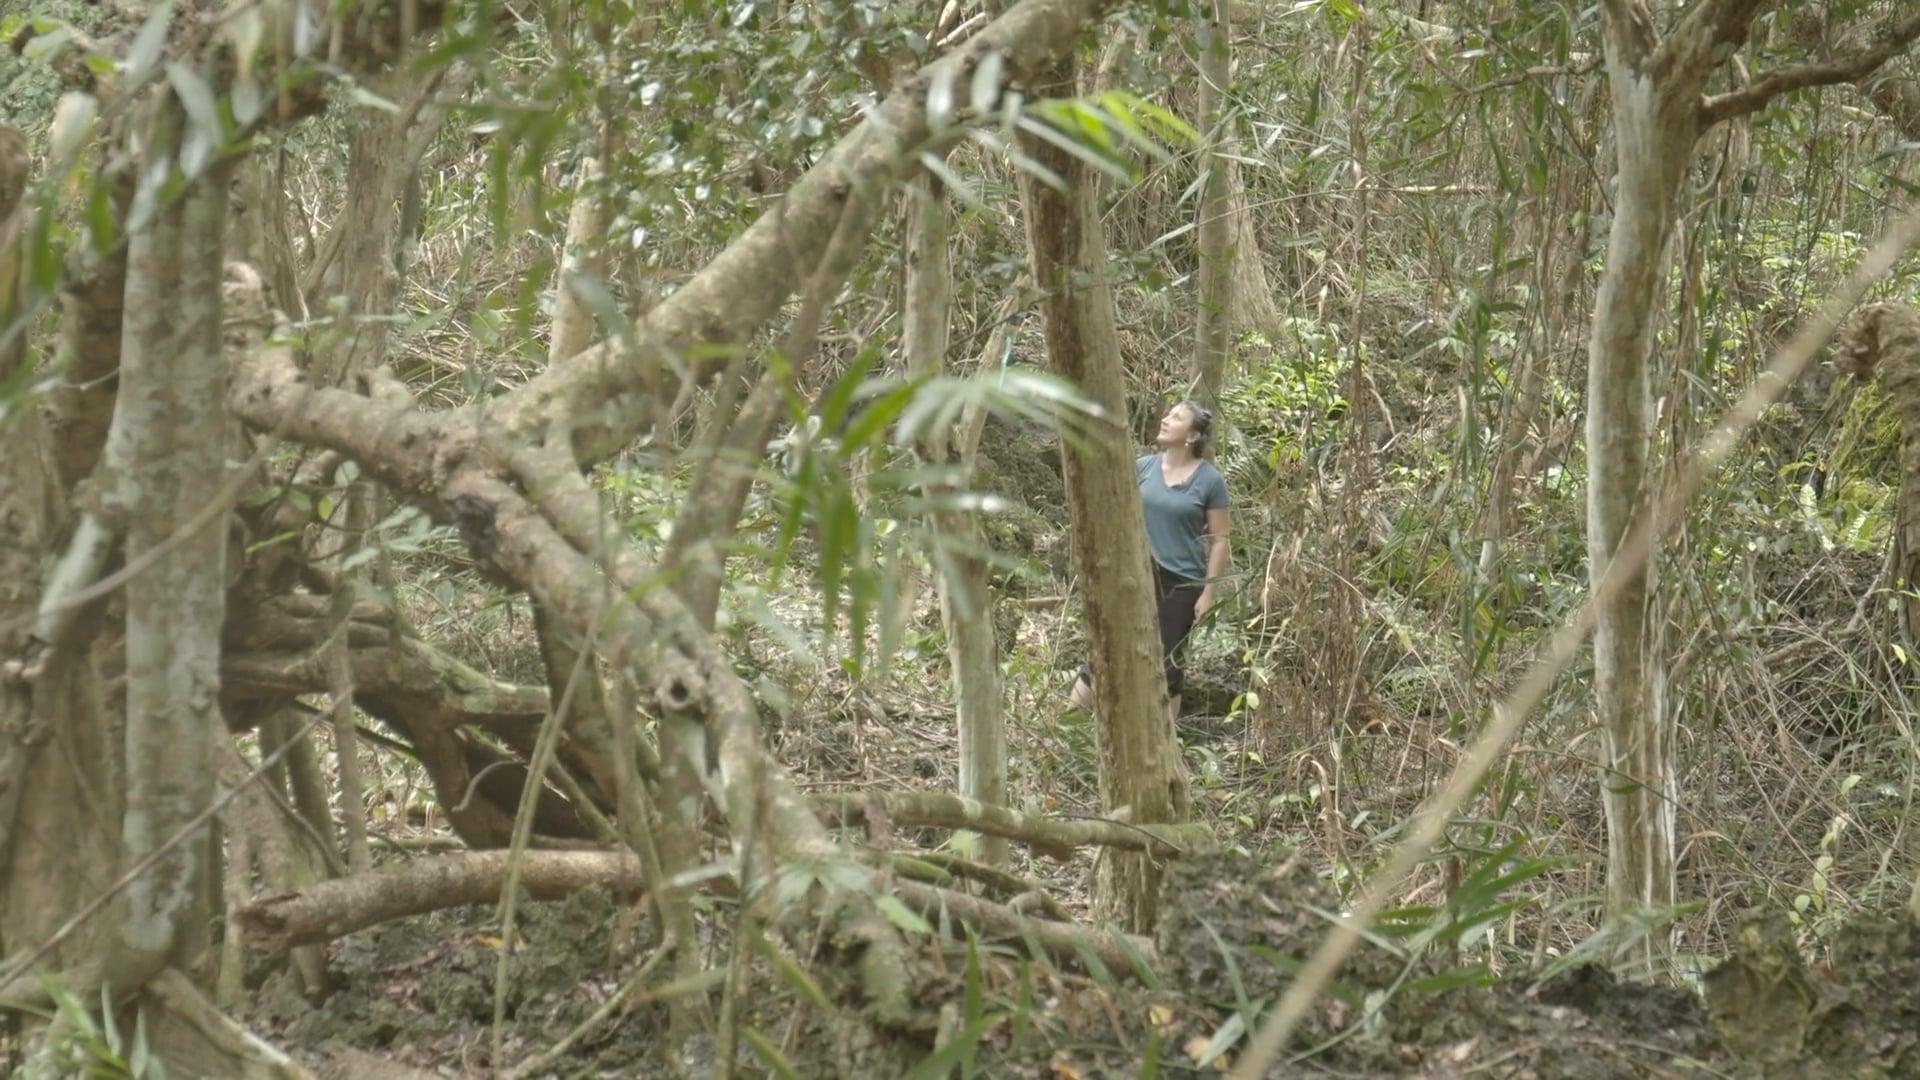 The Silent Forests  - documentary - trailer (dir. James Bateman)